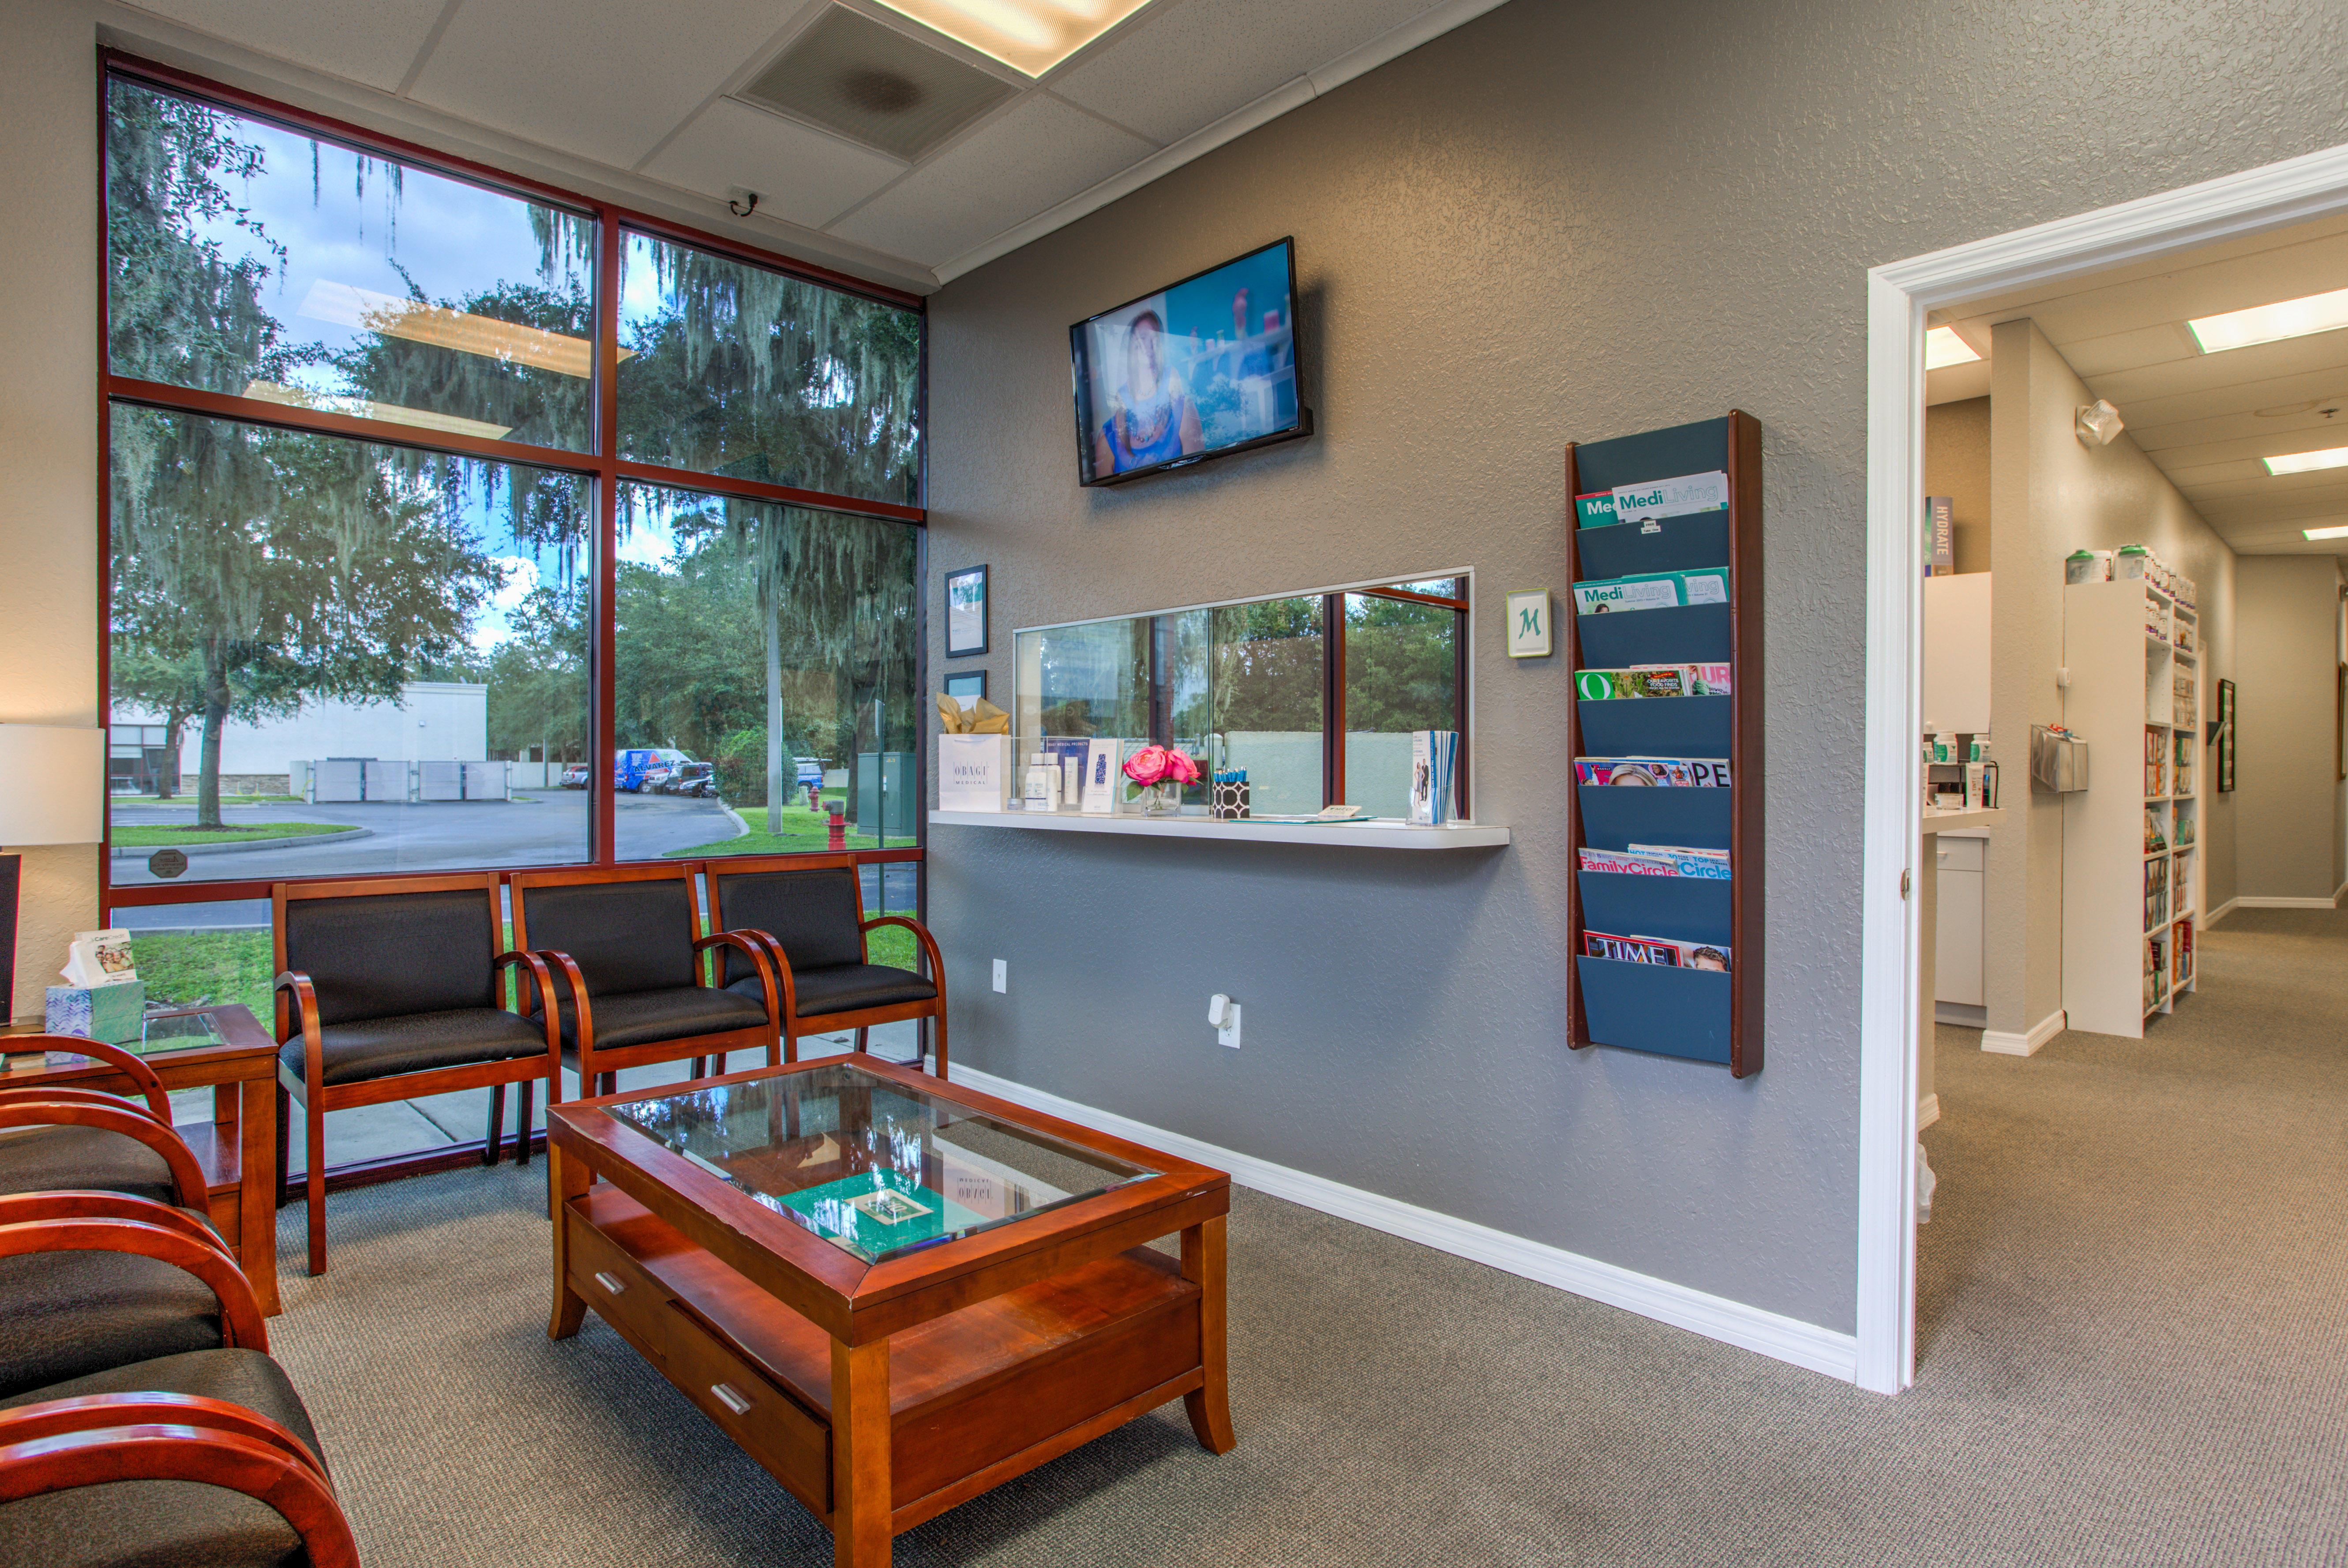 GNC in Brandon, Florida| Business Profile | Infofree.com